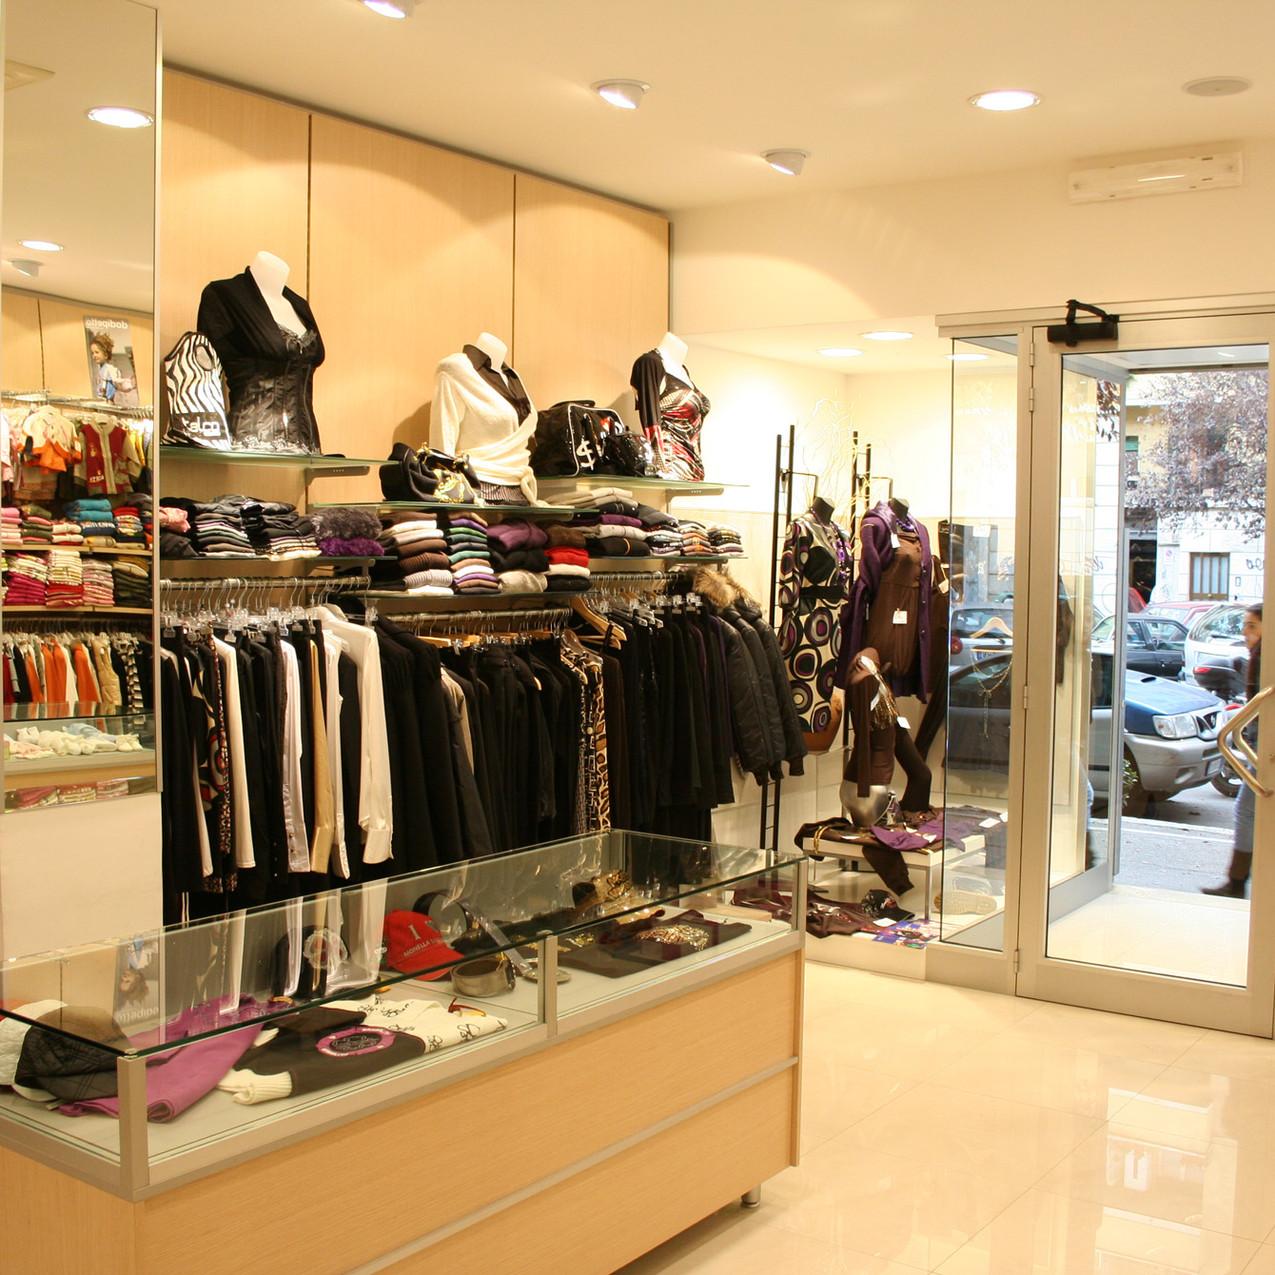 arredamenti-negozi-abbigliamento-donna-ek-10